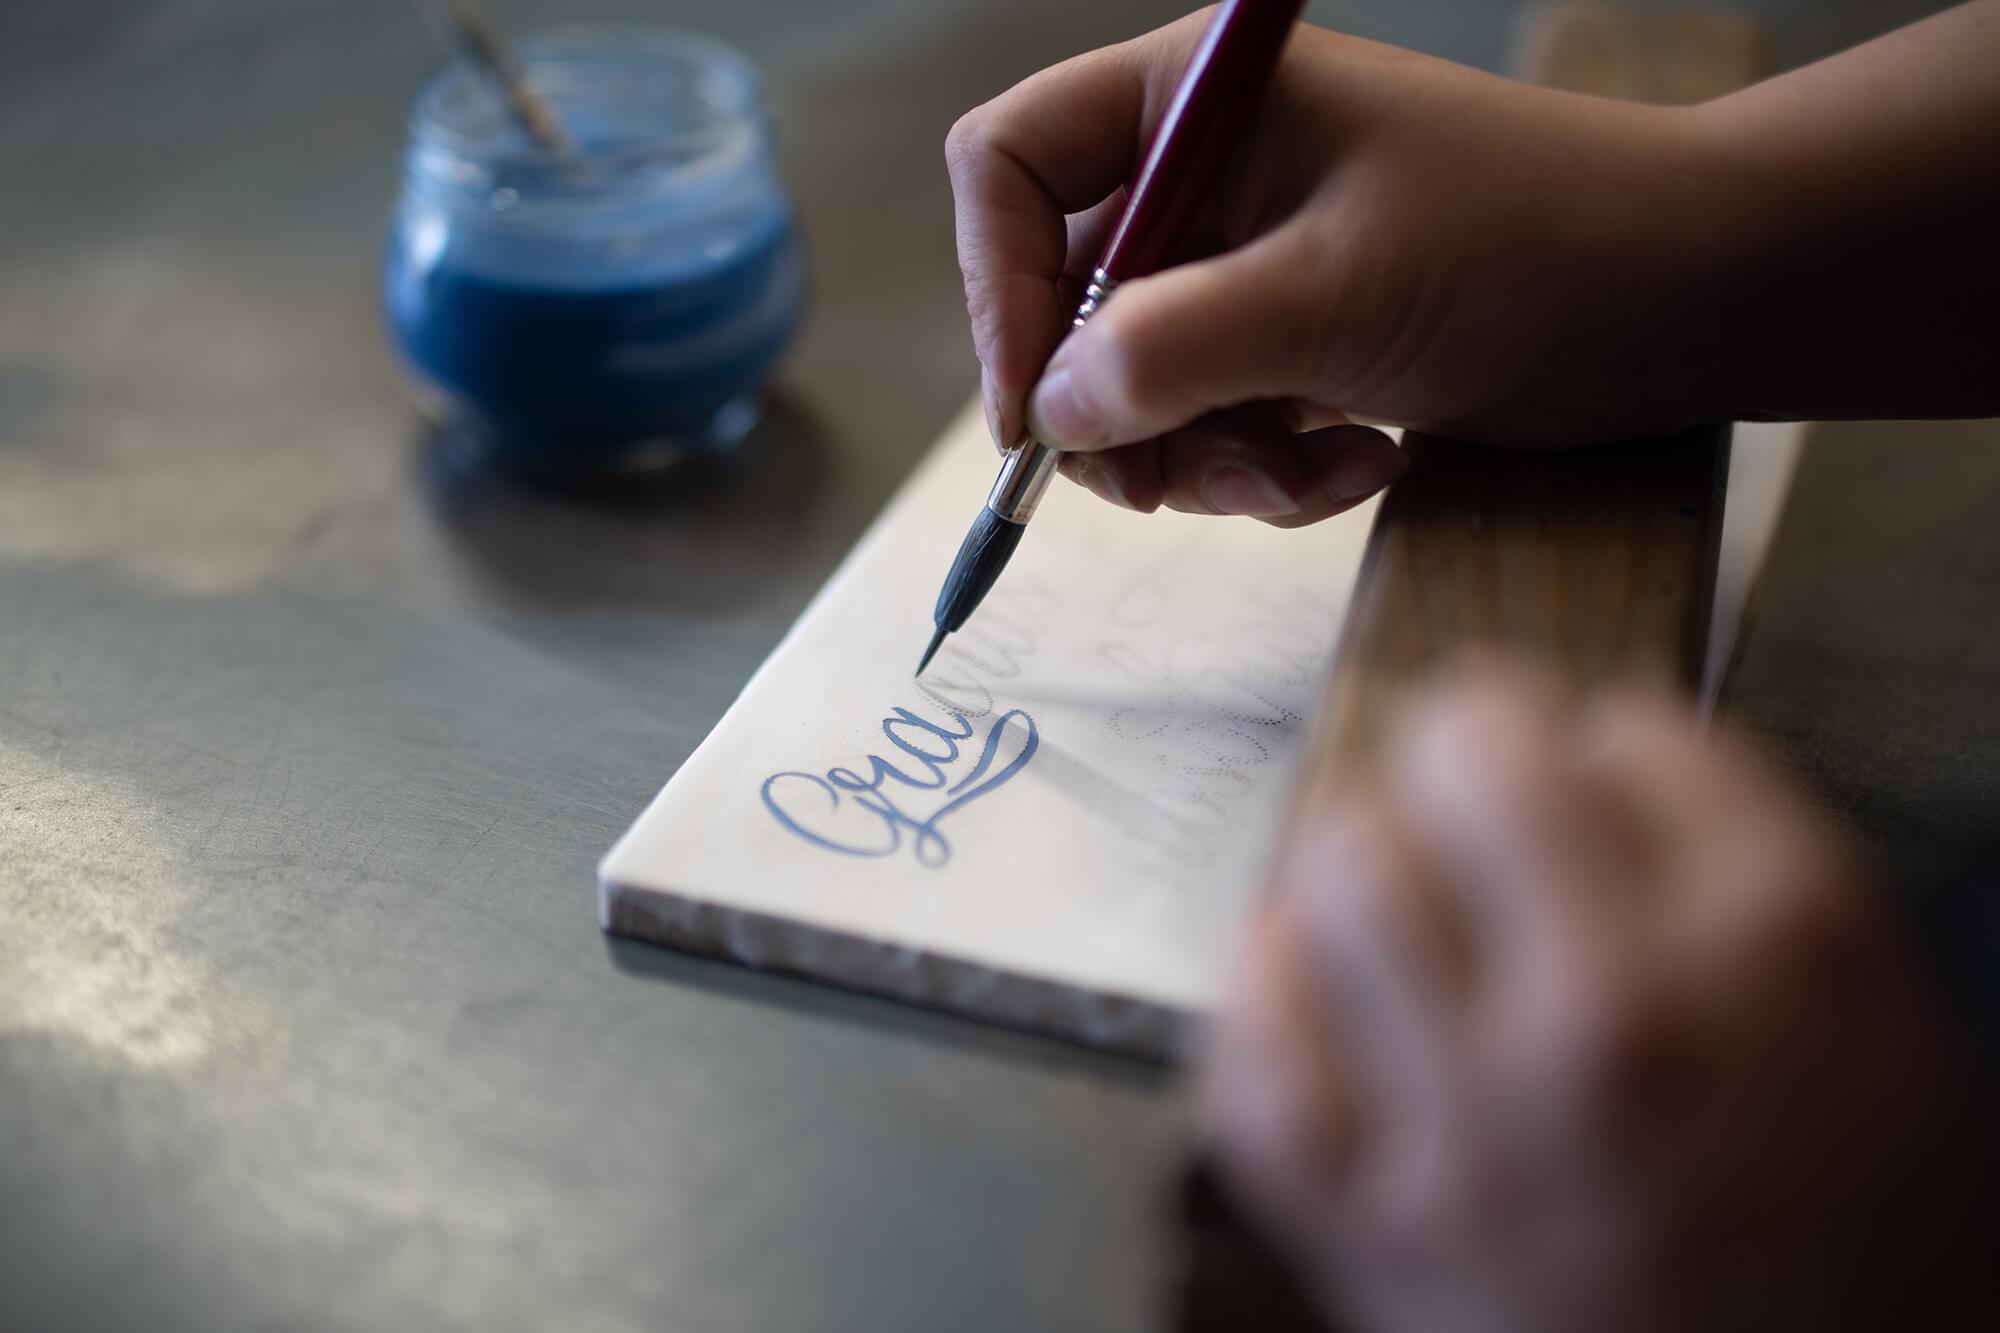 artesanal a medida - Inicio